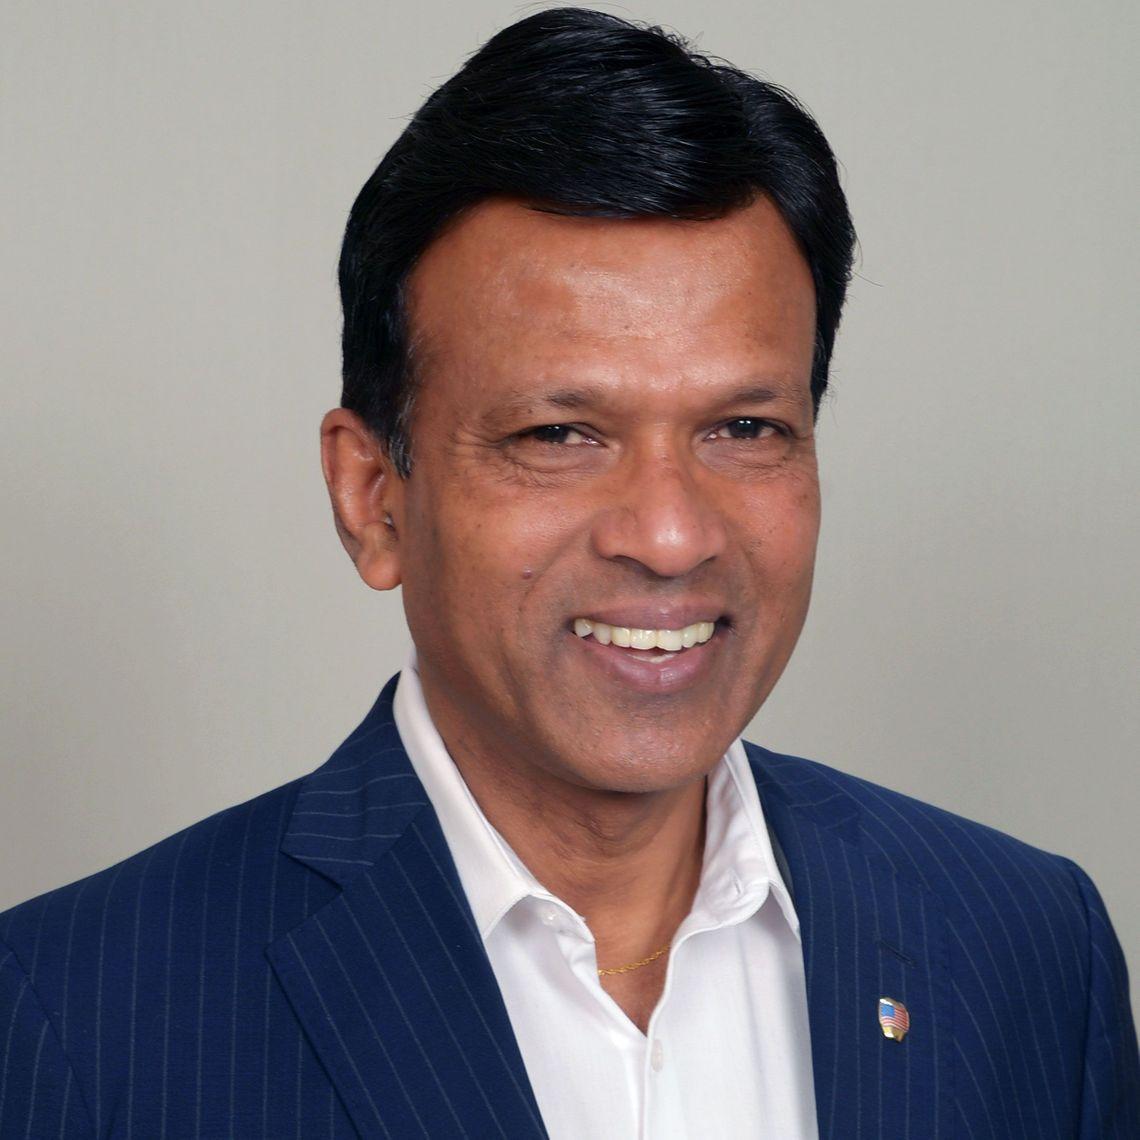 Rajiv Gowda